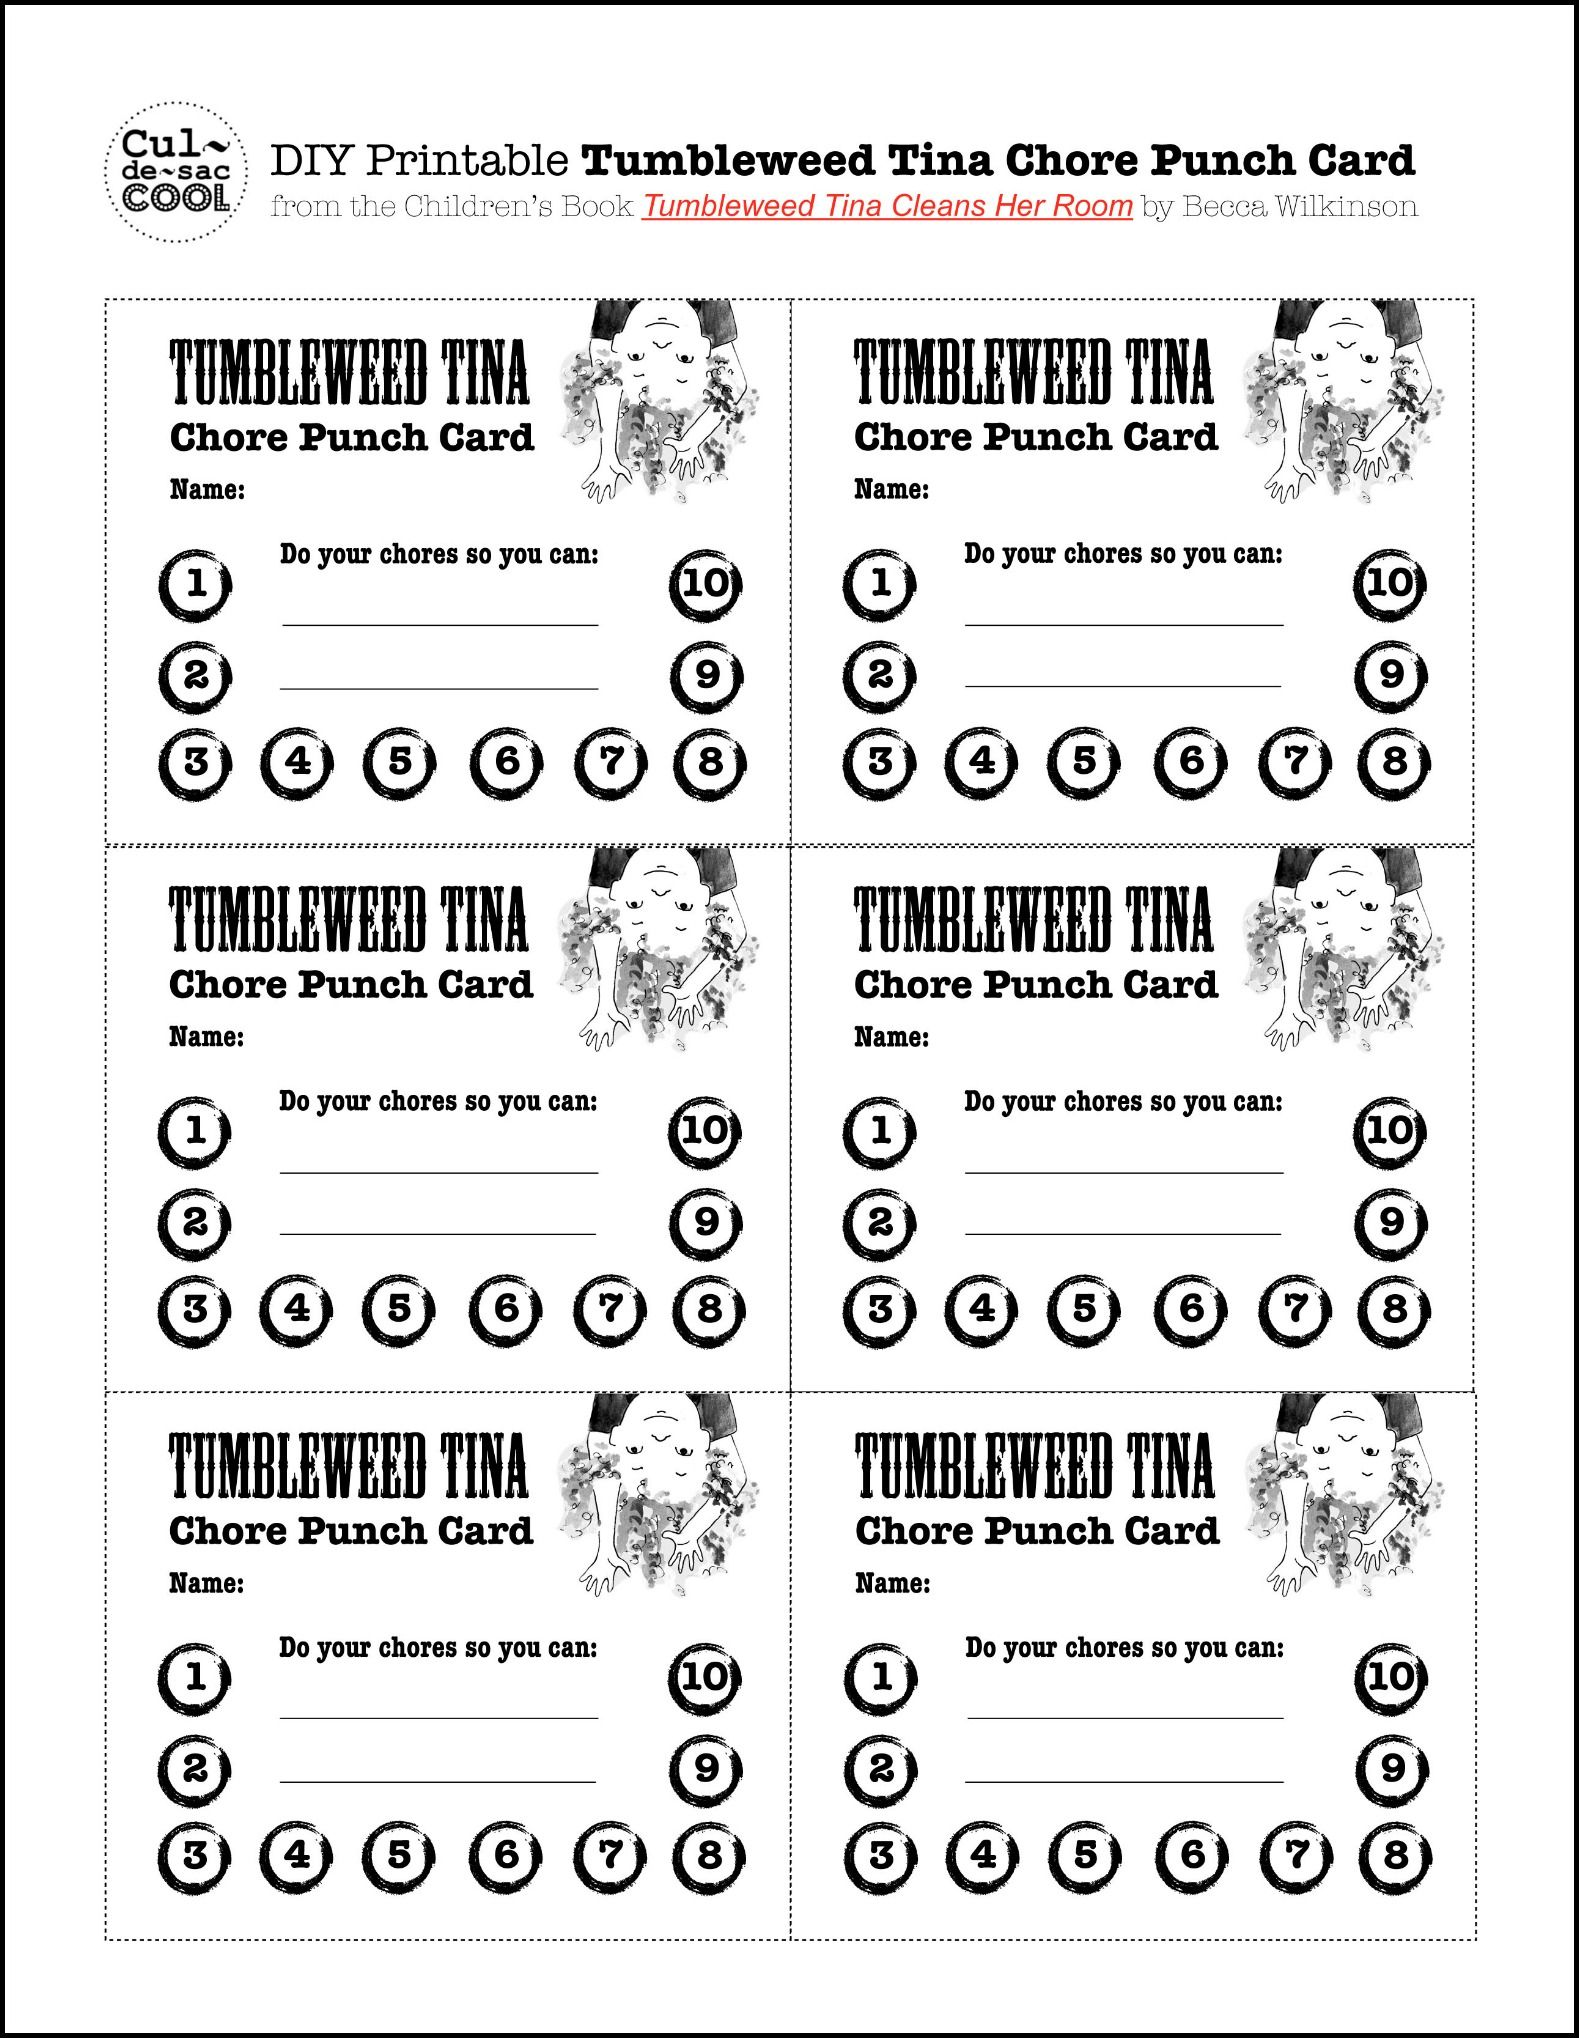 Diy Printable Tumbleweed Tina Chore Punch Card Spired